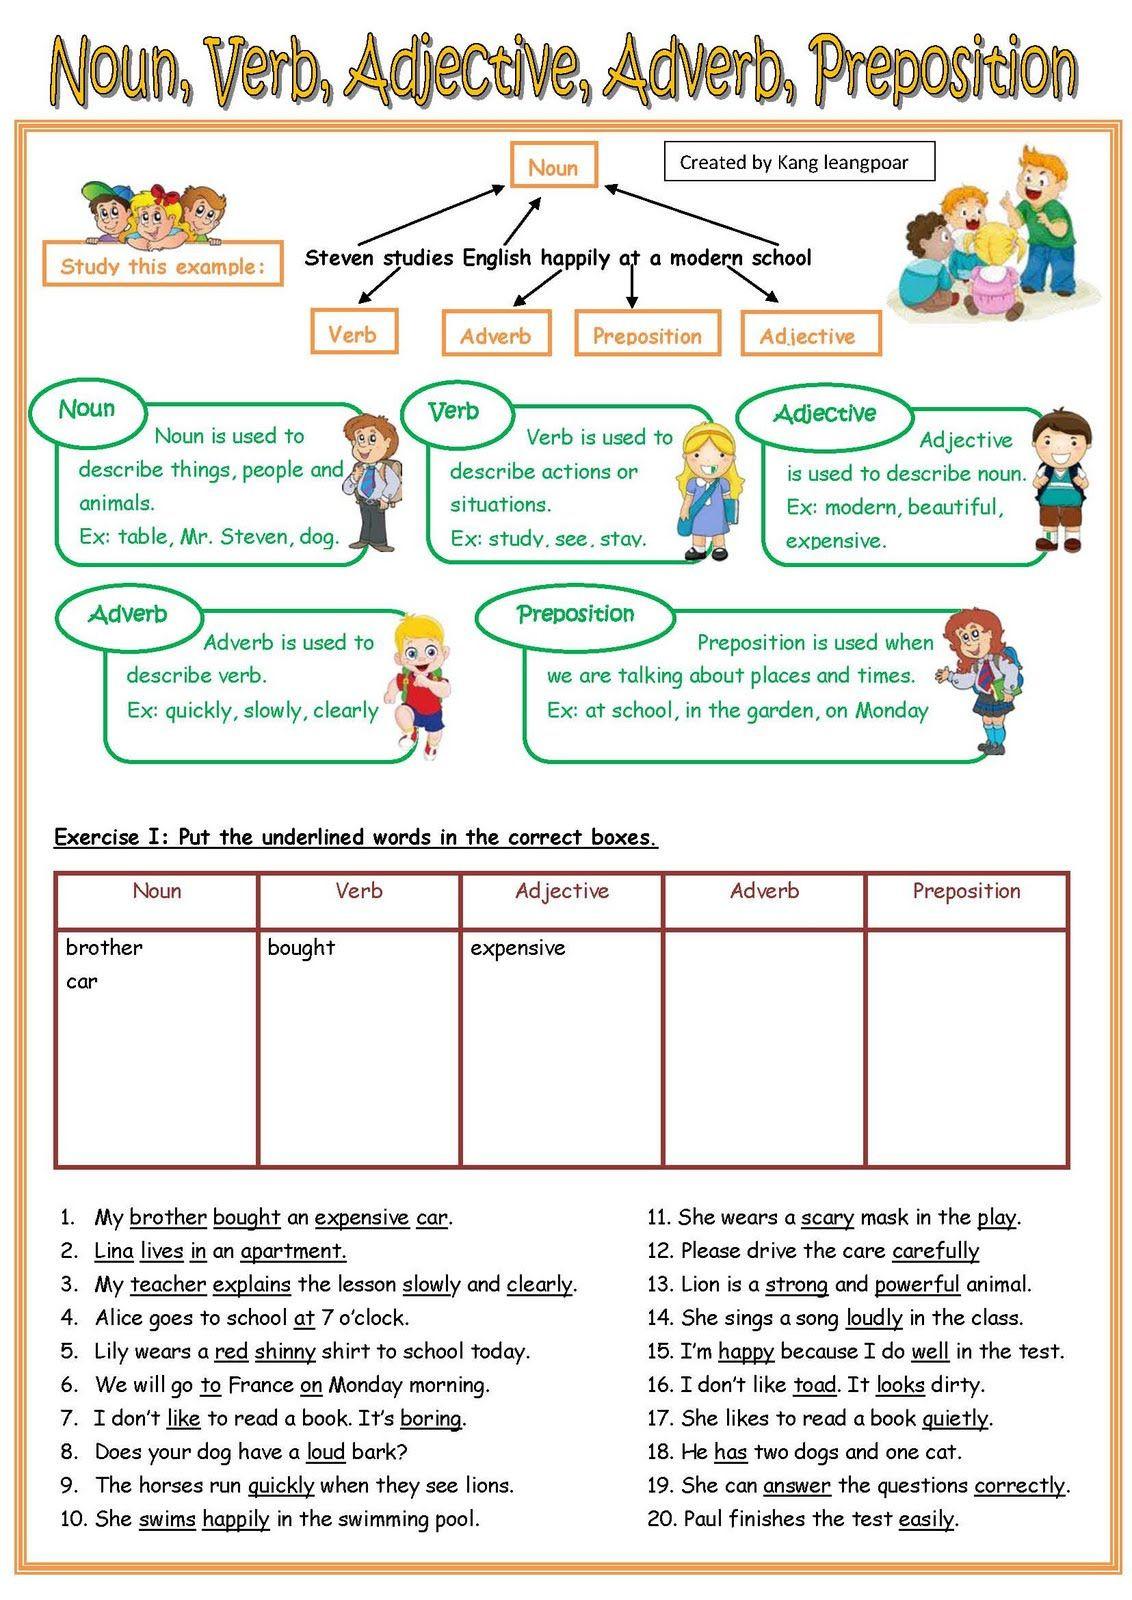 Noun Verb Adjective Worksheet Noun Verb Adjective Adverb Pre Page 1 1132—1600